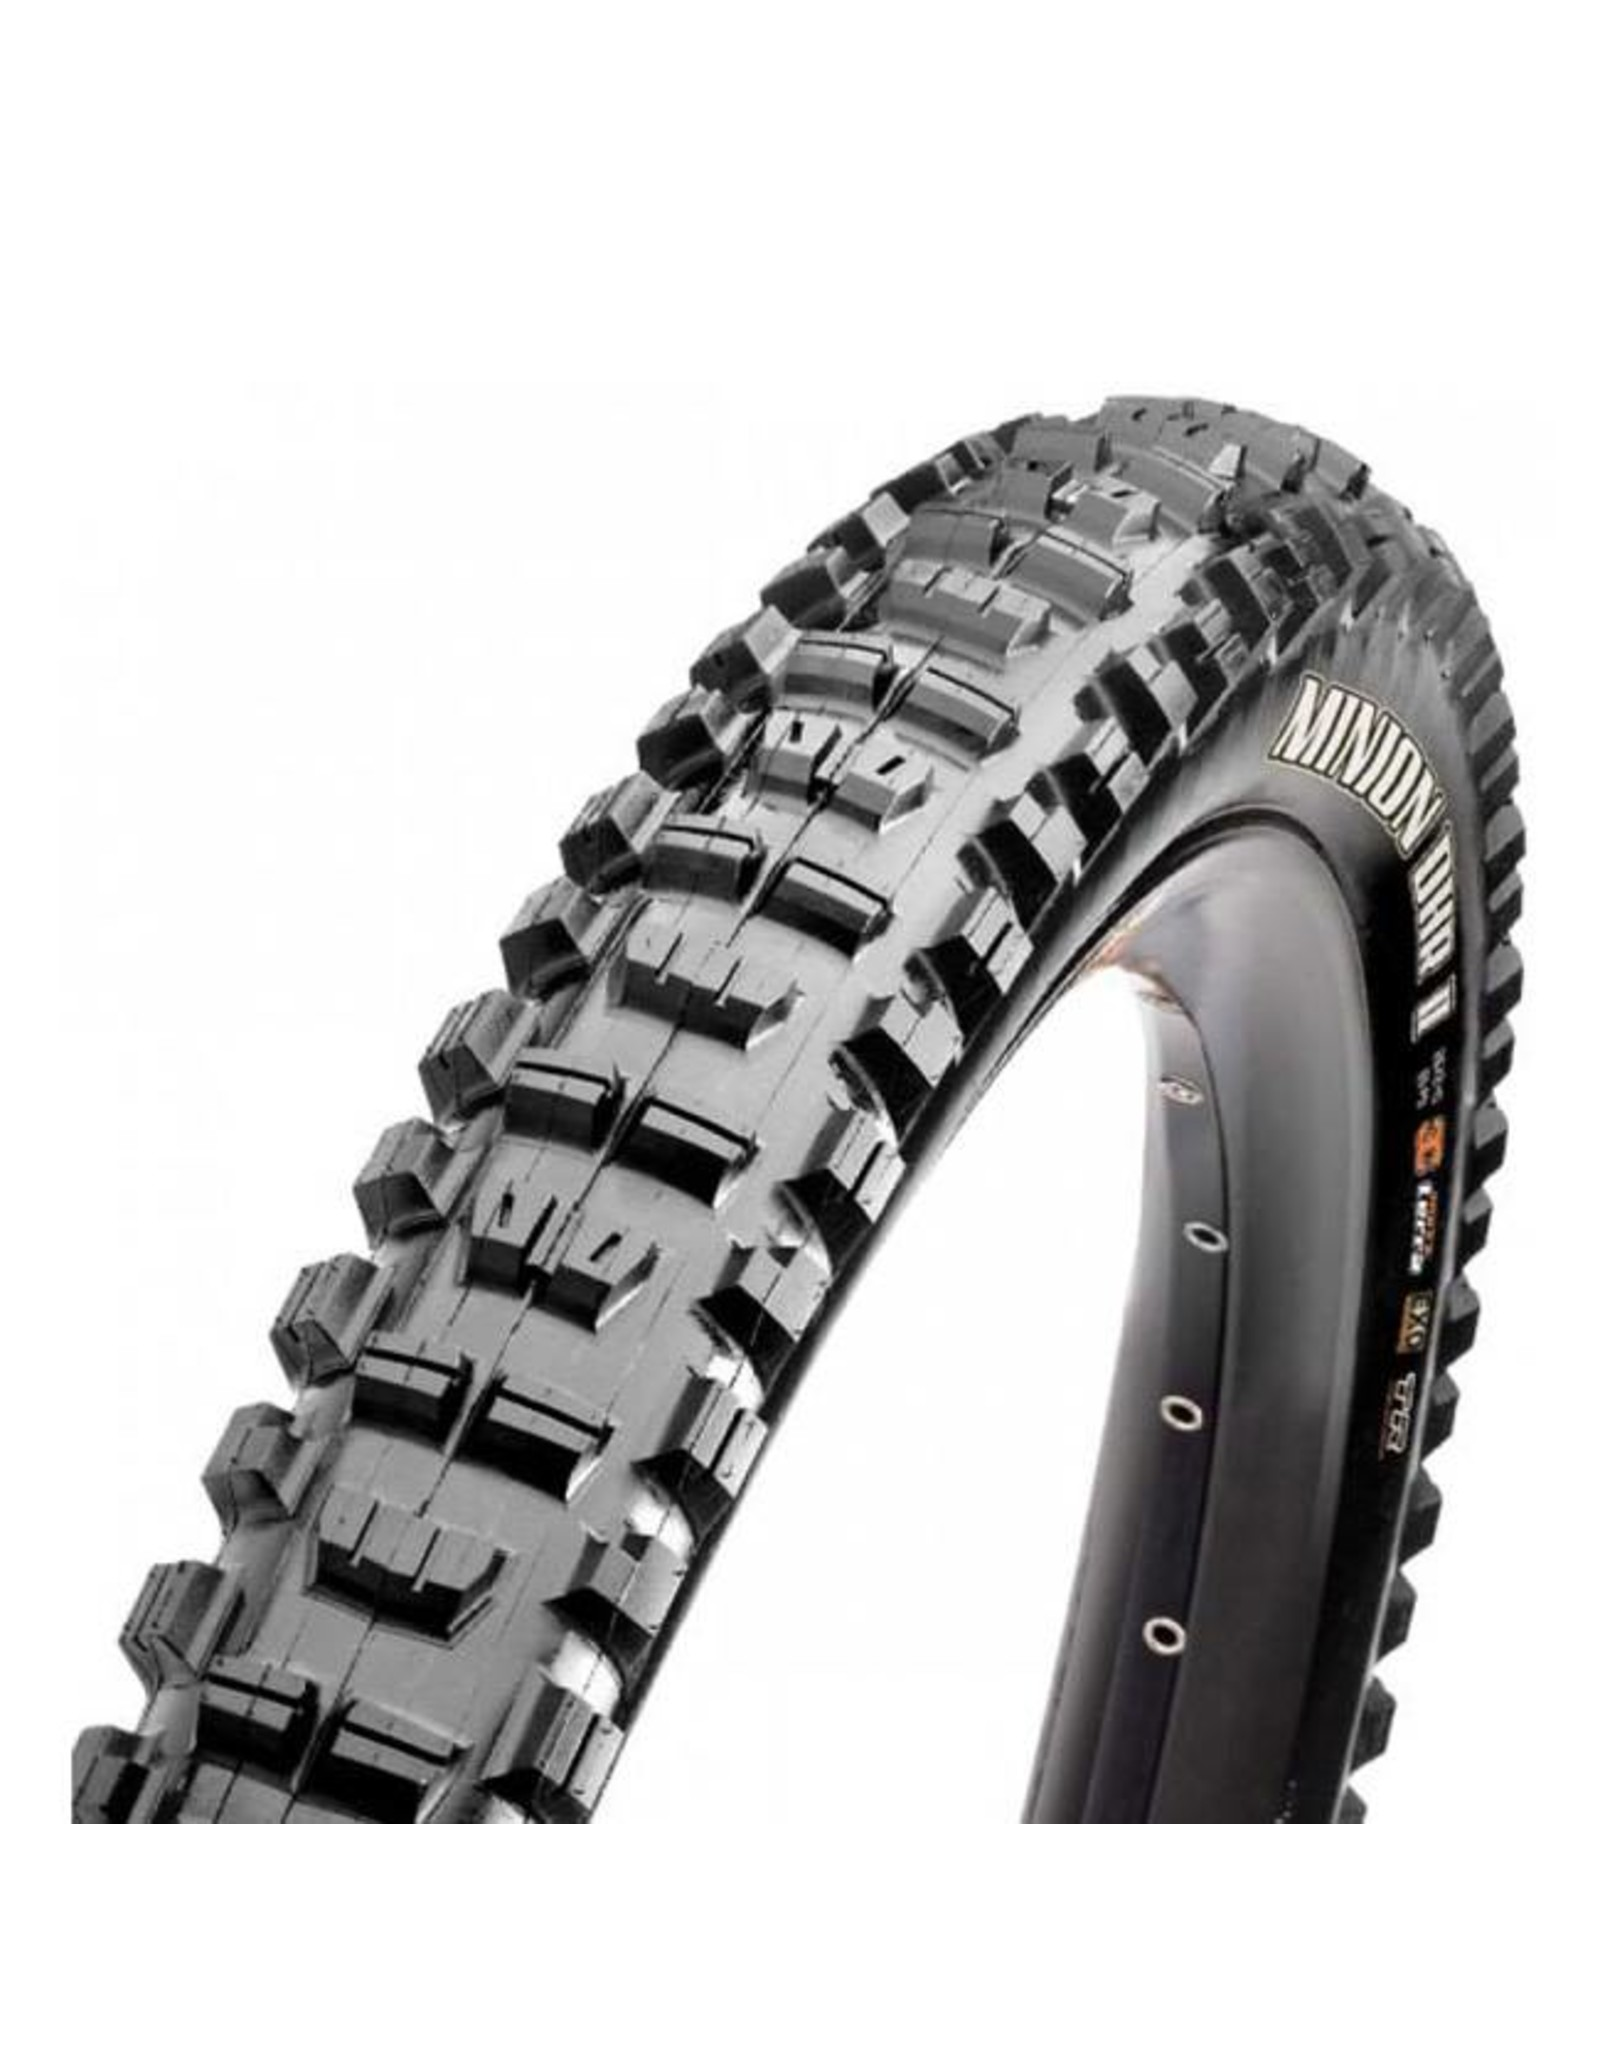 "Maxxis Maxxis Minion DHR II Tire: 29 x 3.00"", Folding, 60tpi, Dual Compound, EXO, Tubeless Ready, Black"